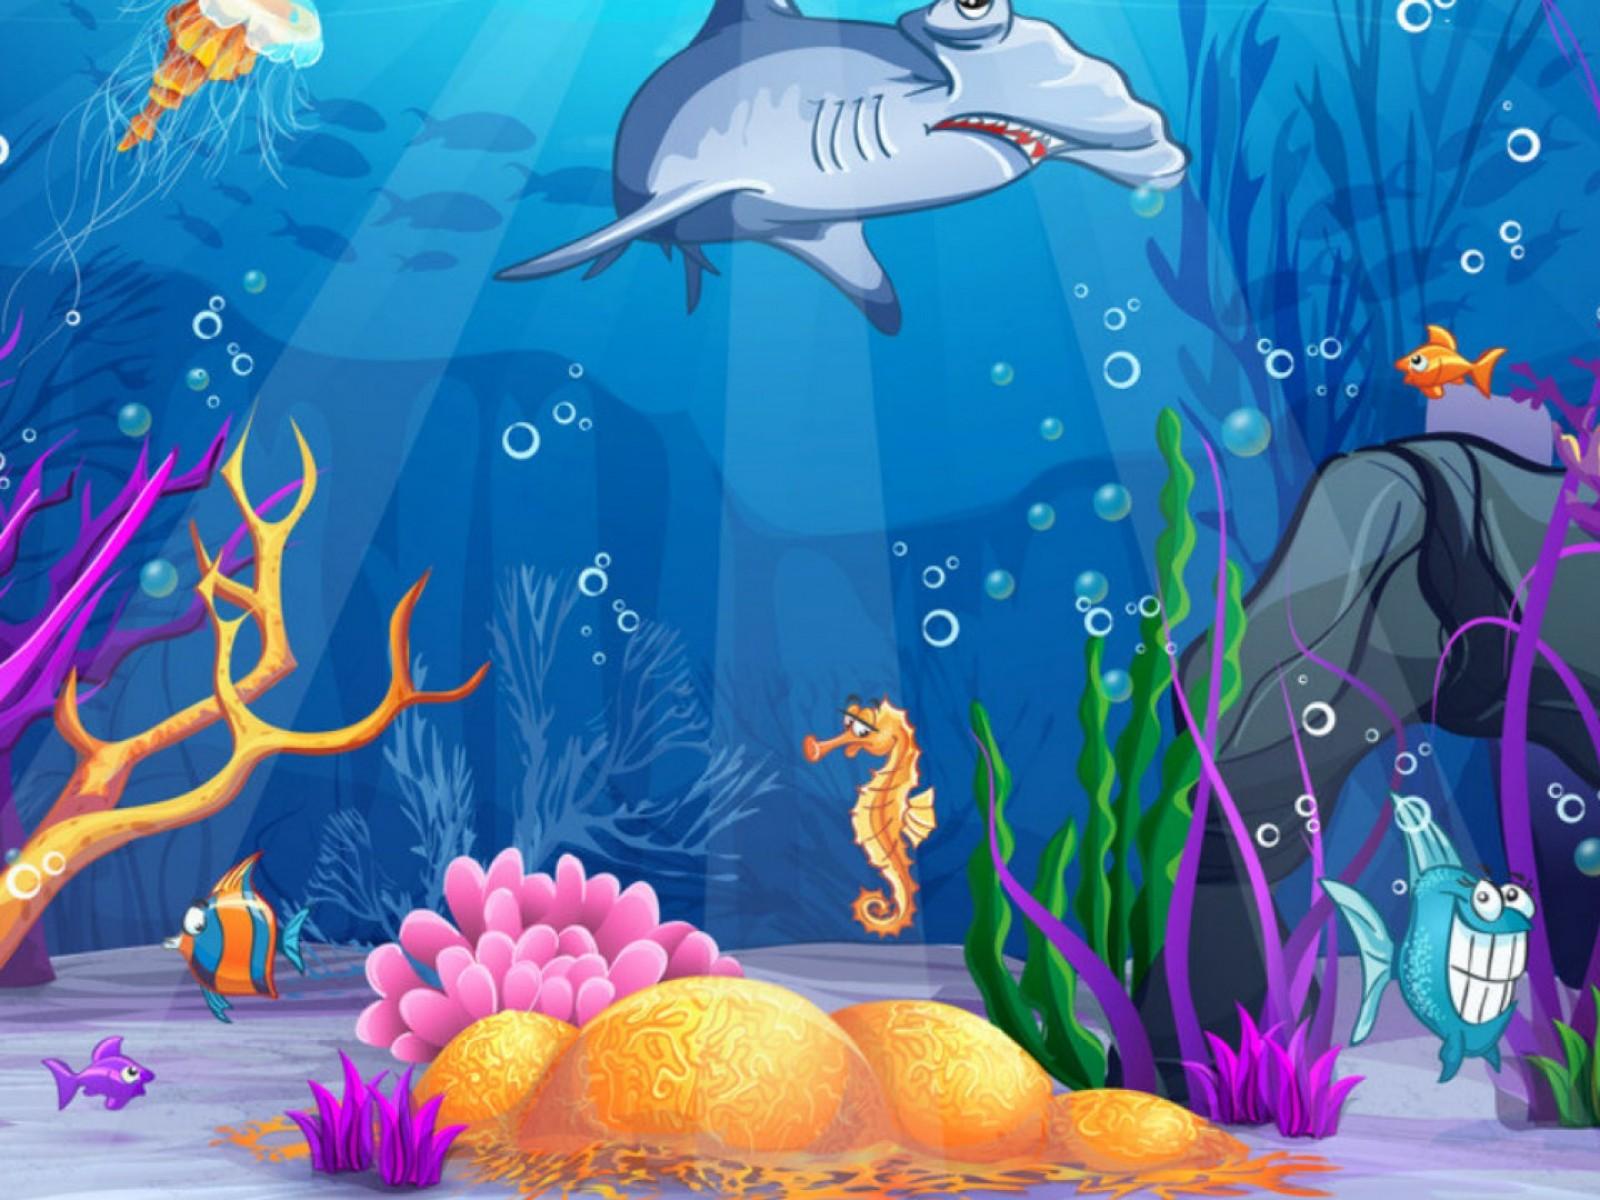 Ocean clipart underwater. Free cliparts download clip